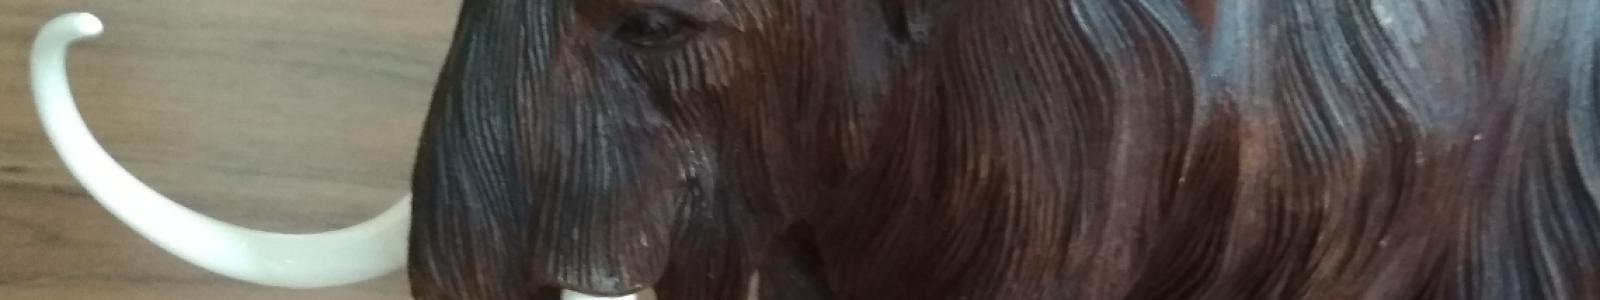 Gallery Painter Vladimir Realmammoth